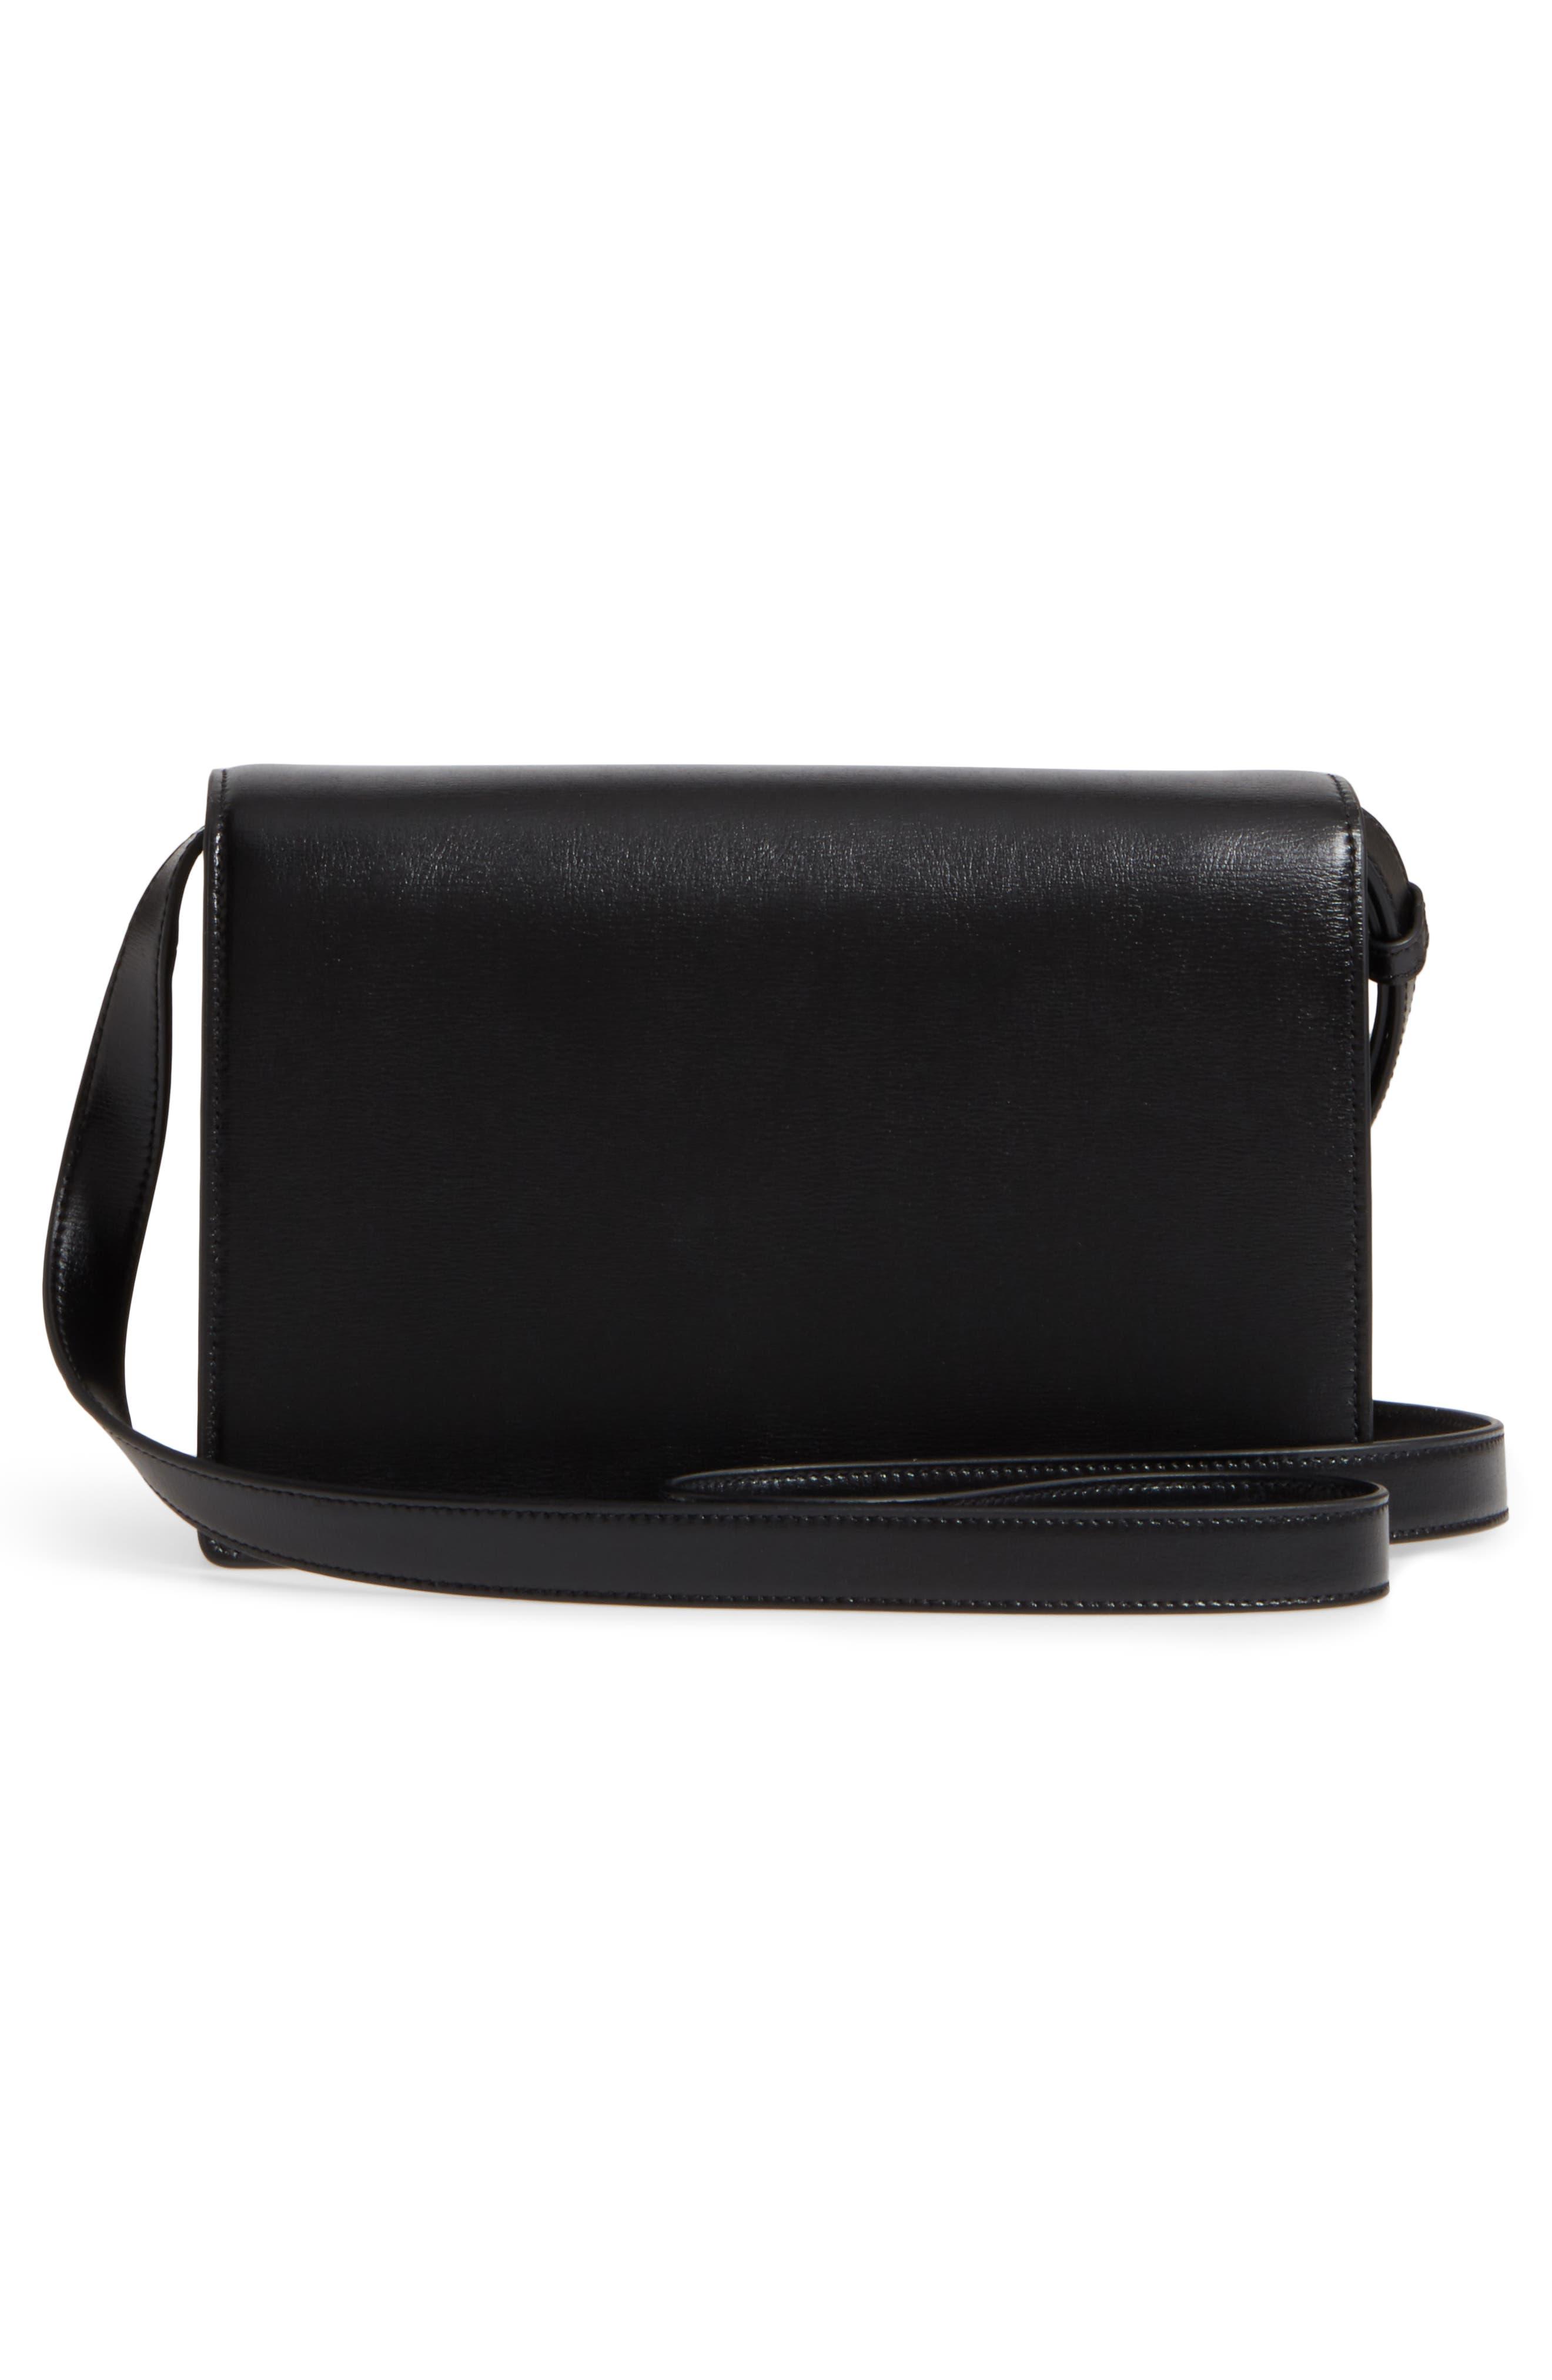 Medium Bellechasse Suede & Leather Shoulder Bag,                             Alternate thumbnail 3, color,                             NOIR